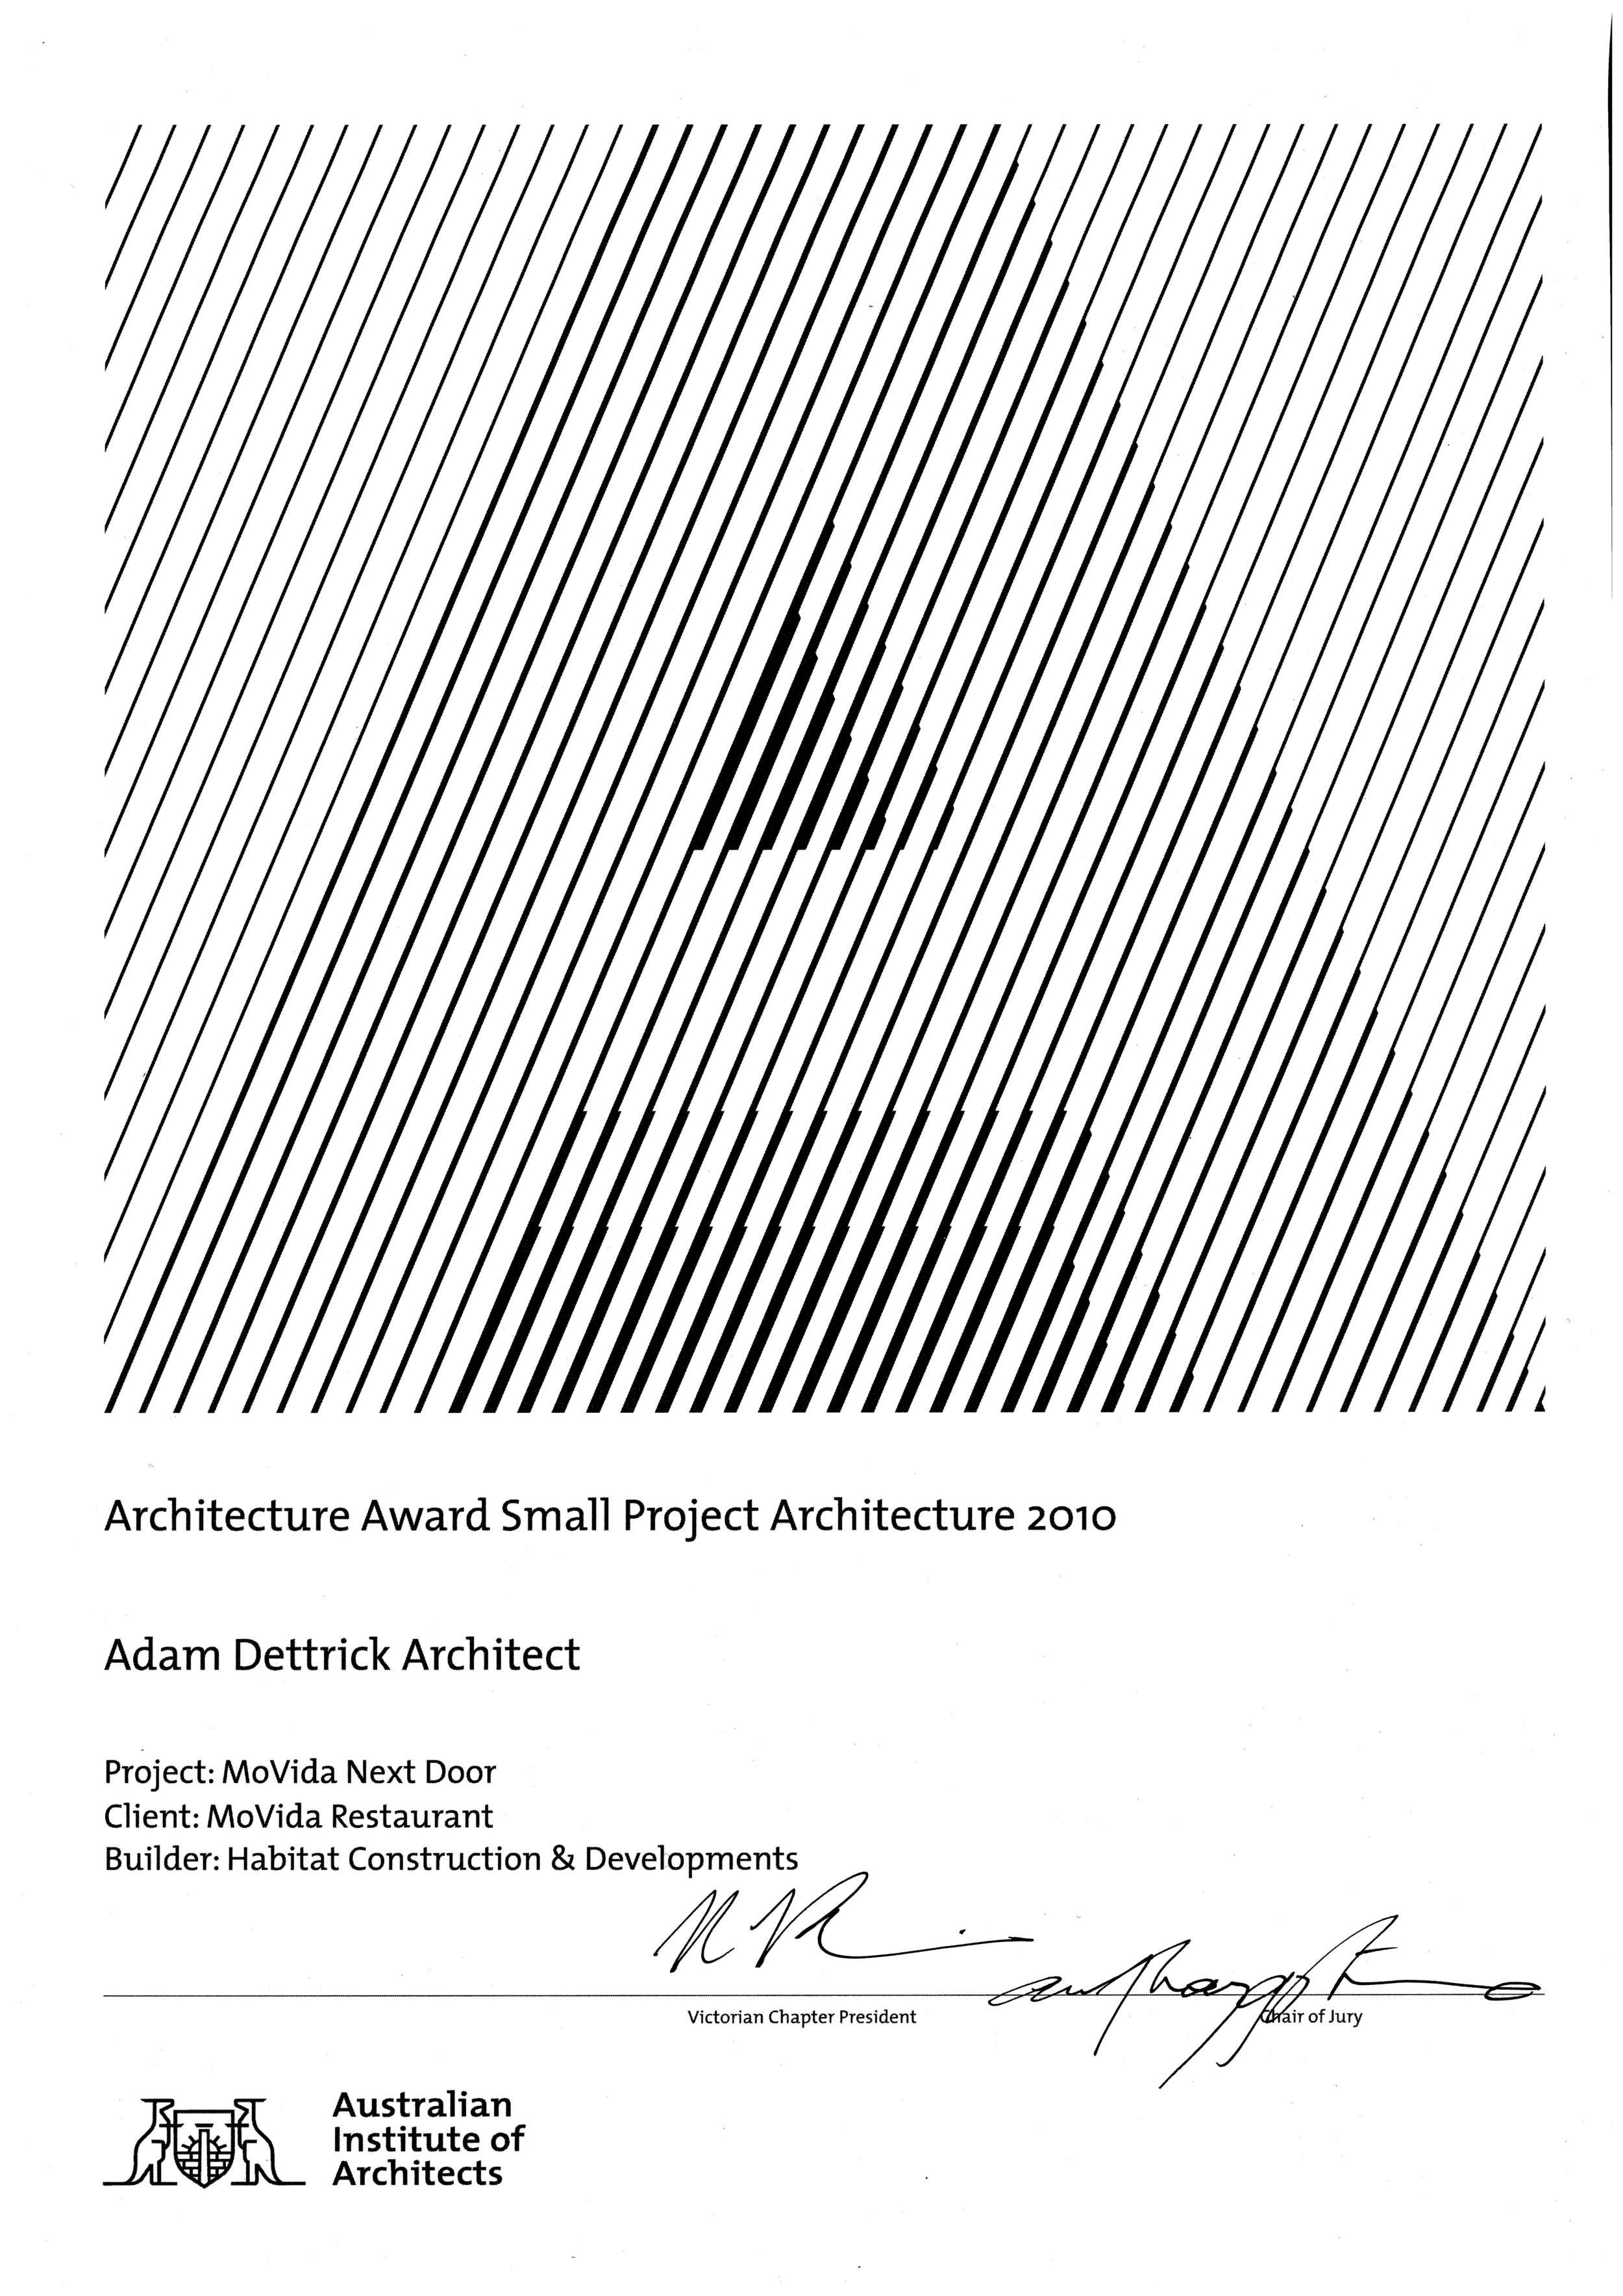 Small Project Award,  Victorian Architecture Awards 2010.    Movida Next Door restaurant, Melbourne